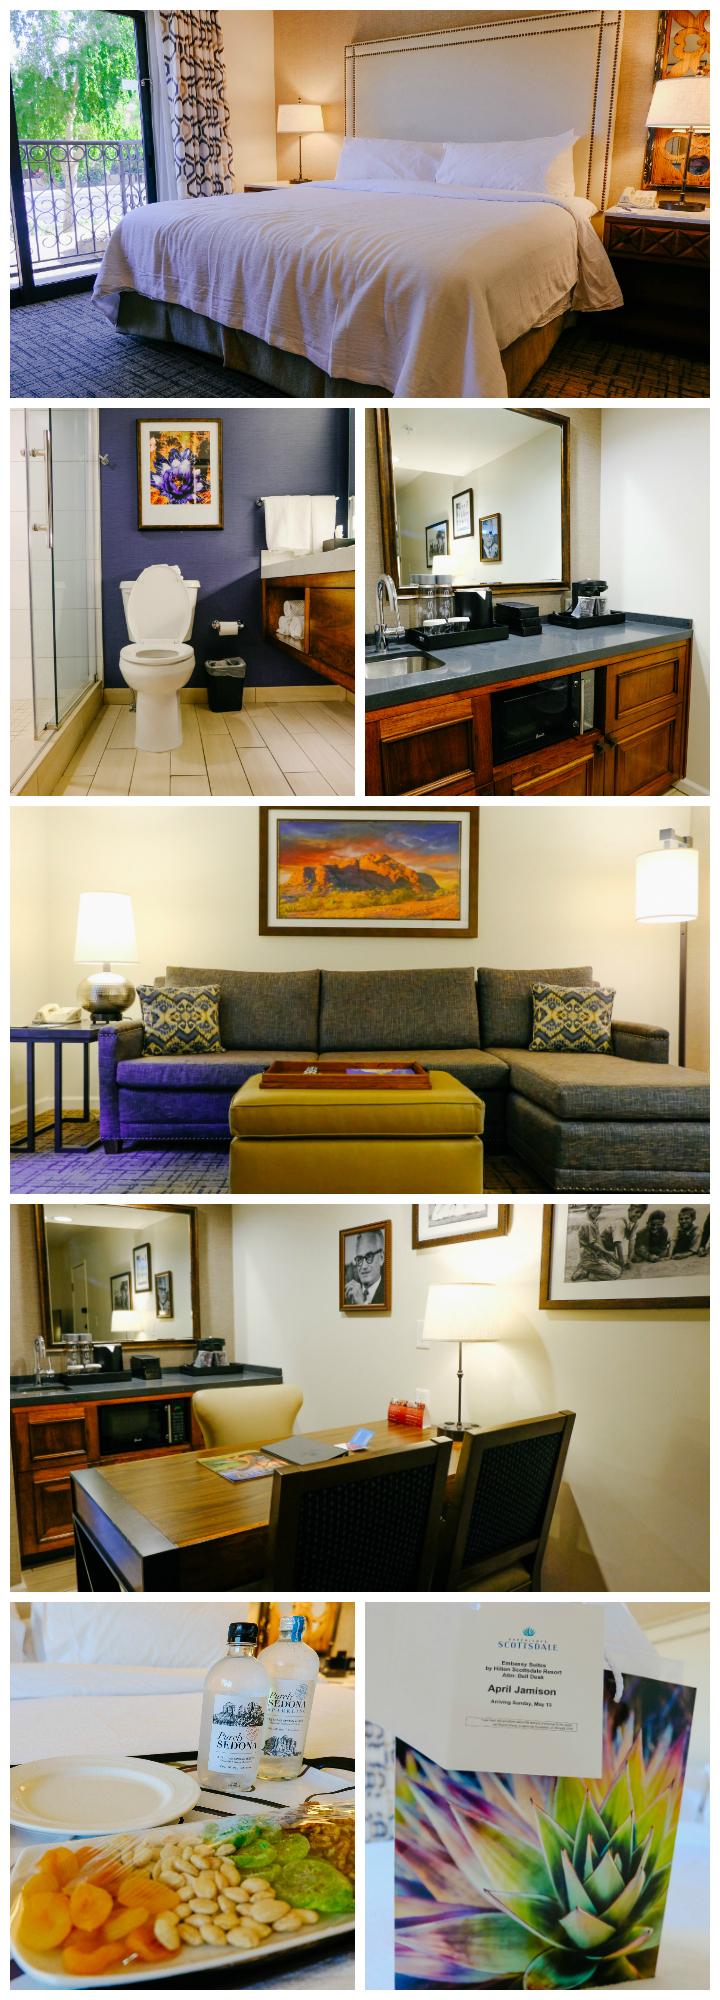 Embassy Suites by Hilton Scottsdale AZ